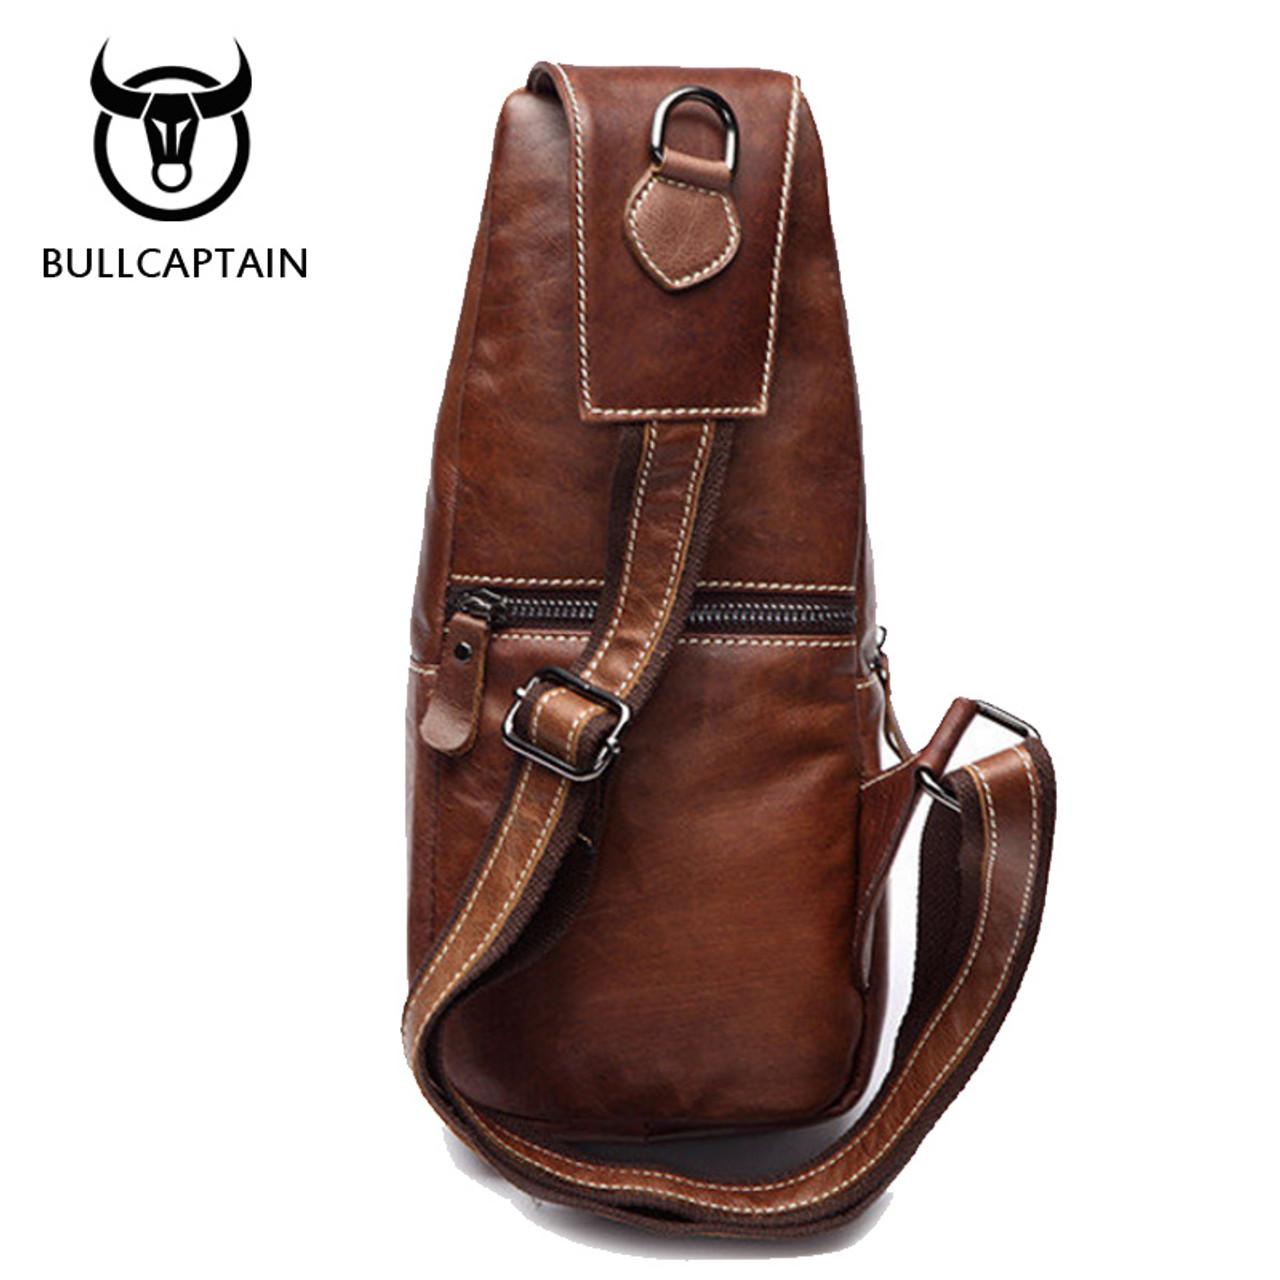 1d54b6c8b1d2 ... BULL CAPTAIN 2017 Fashion Genuine Leather Crossbody Bags men casual  messenger bag Small Brand Designer Male ...